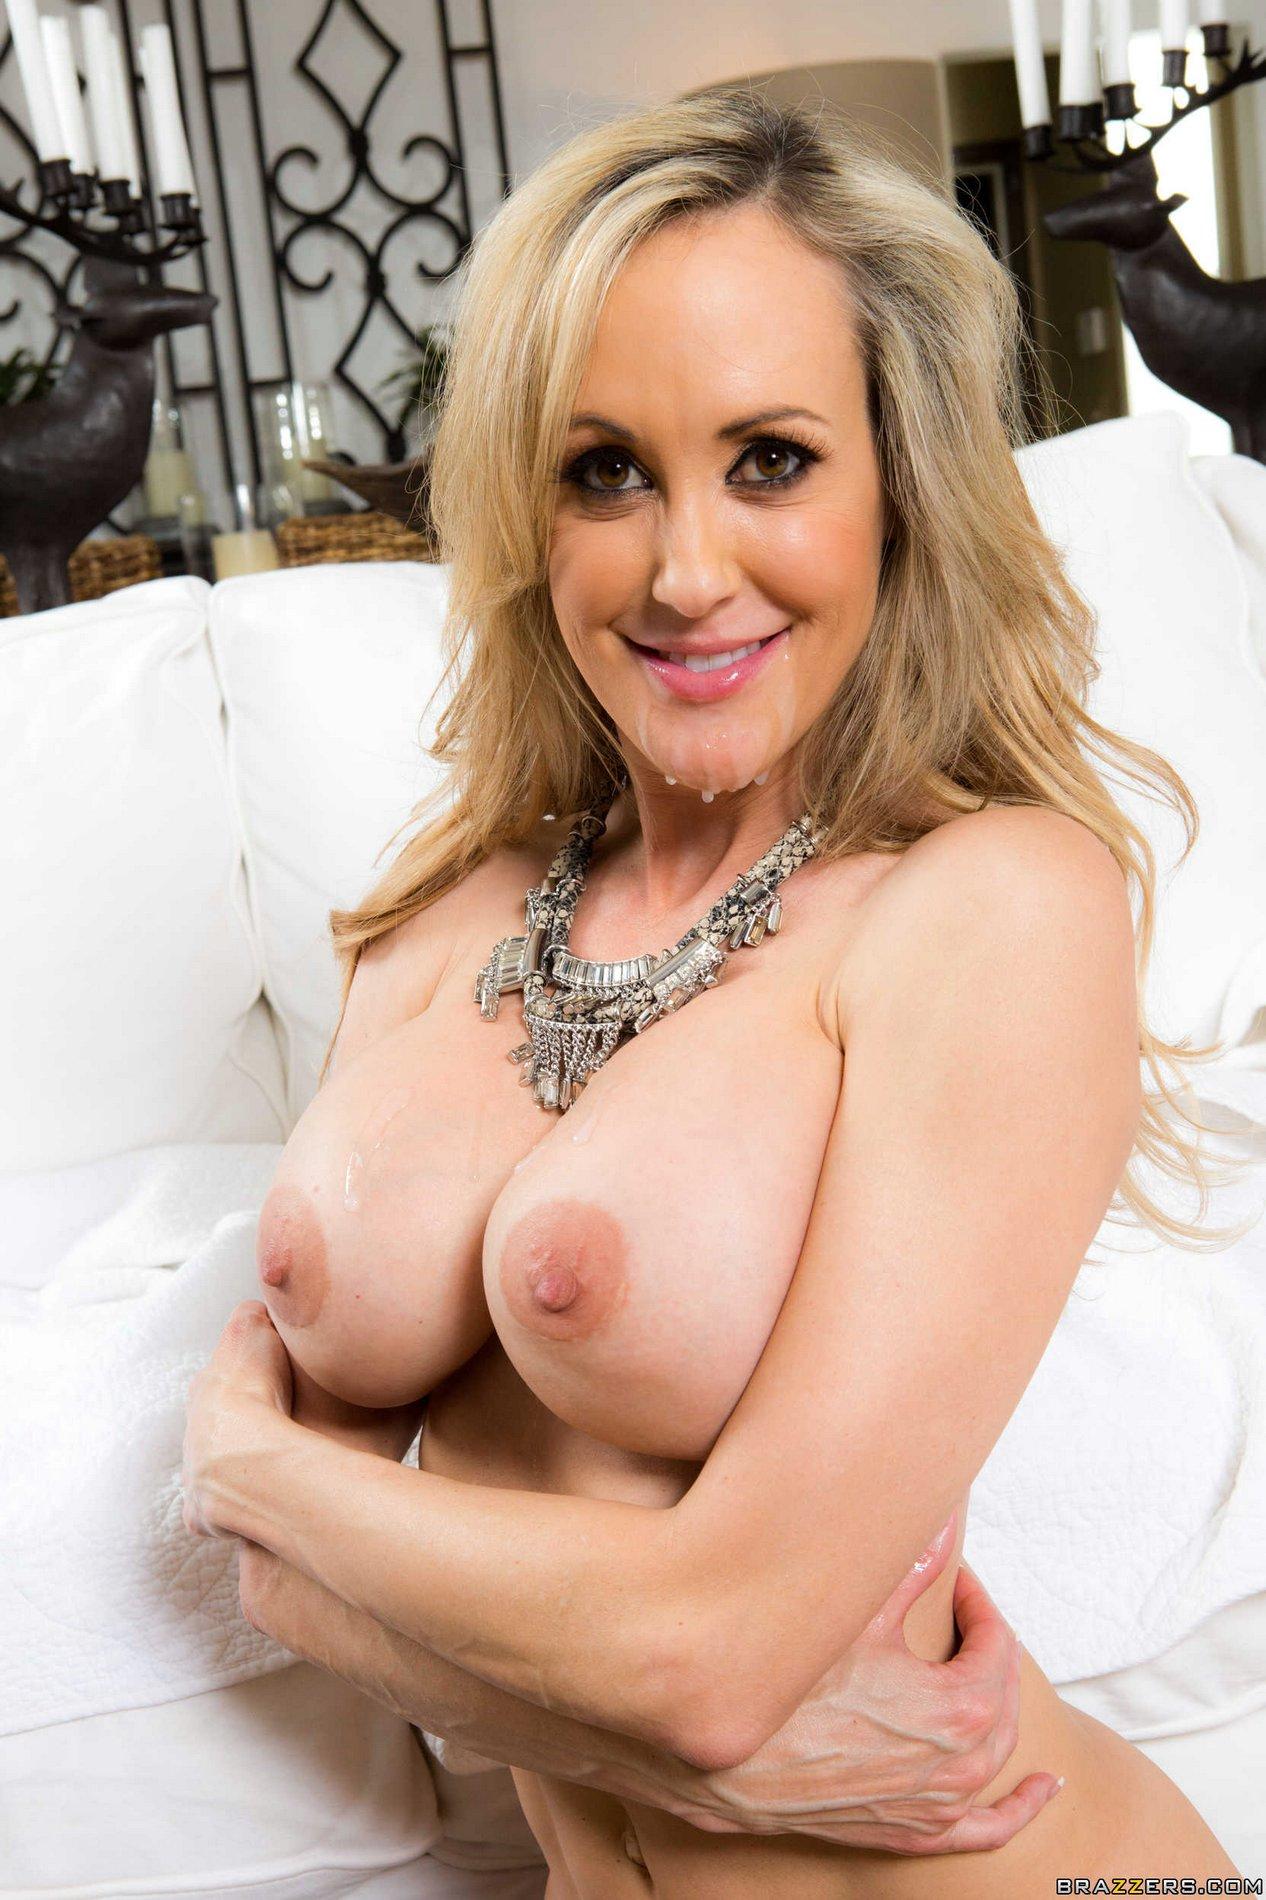 Brandi love huge cock for hire